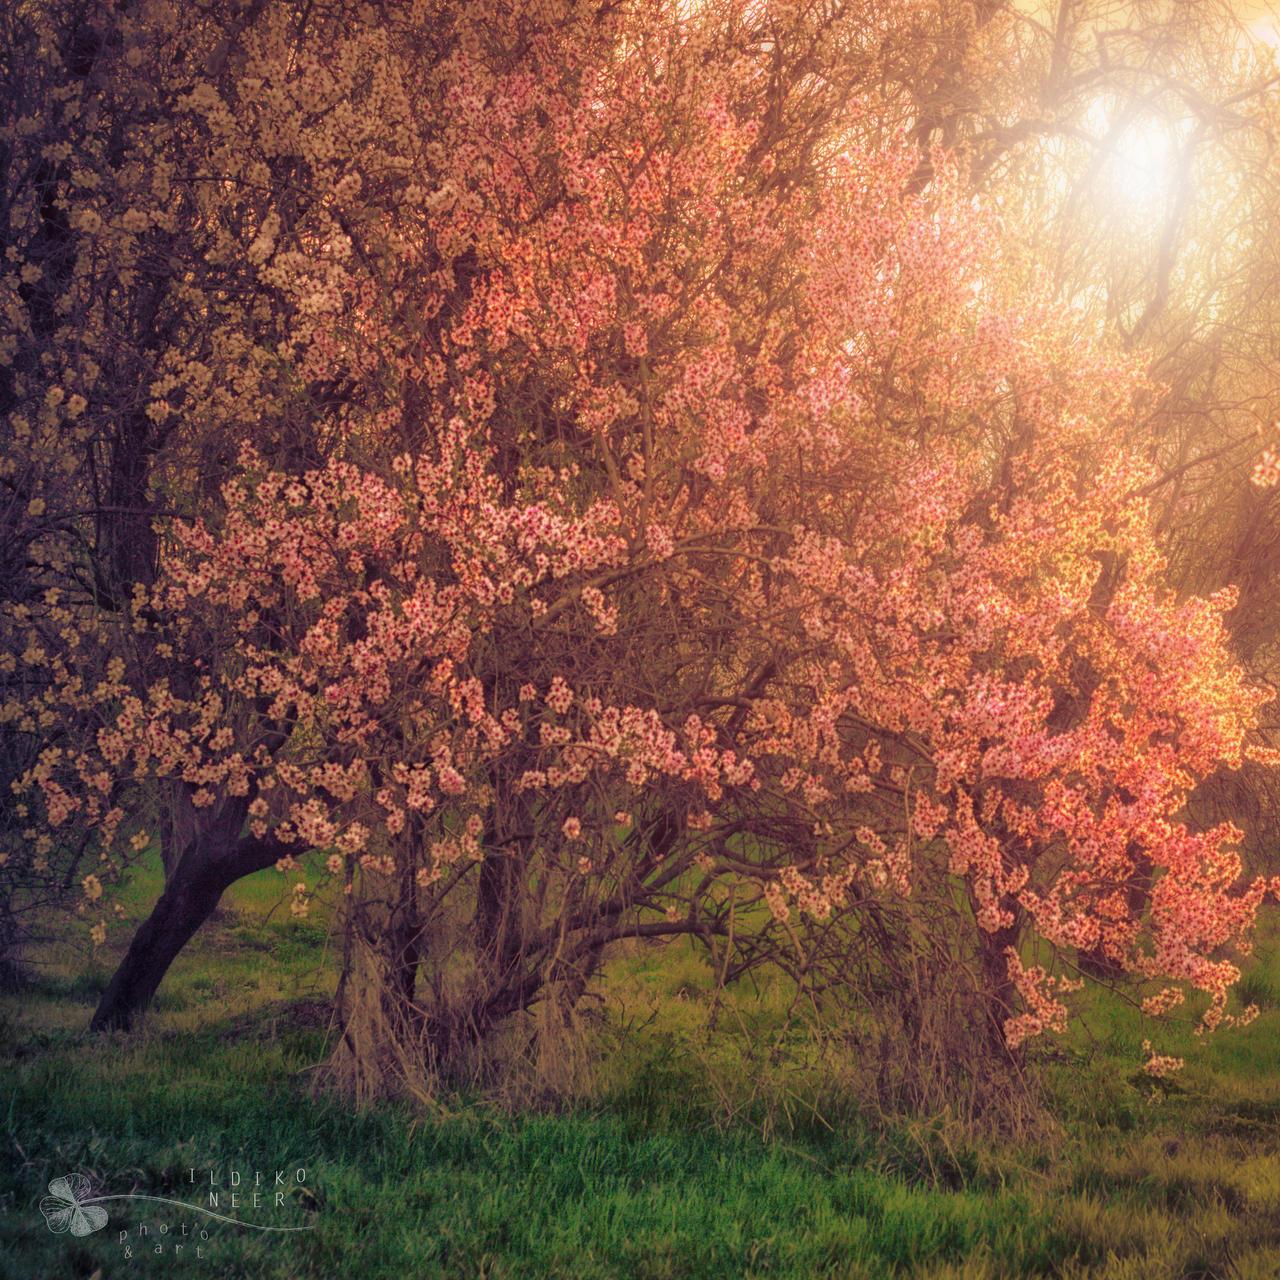 dreamy spring by ildiko-neer